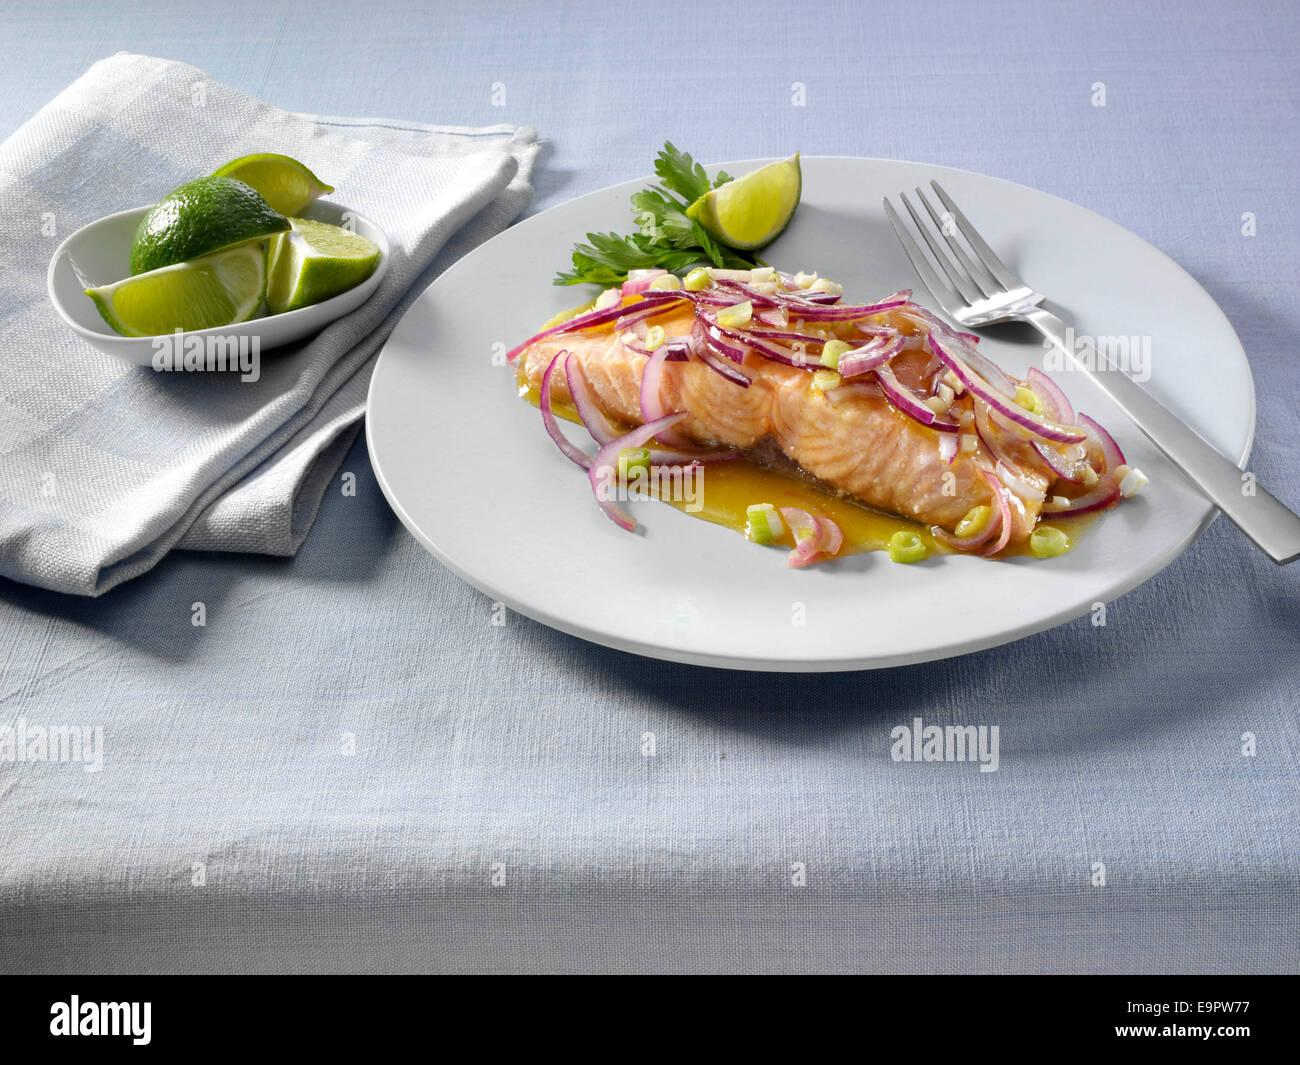 Agave salmon recipes